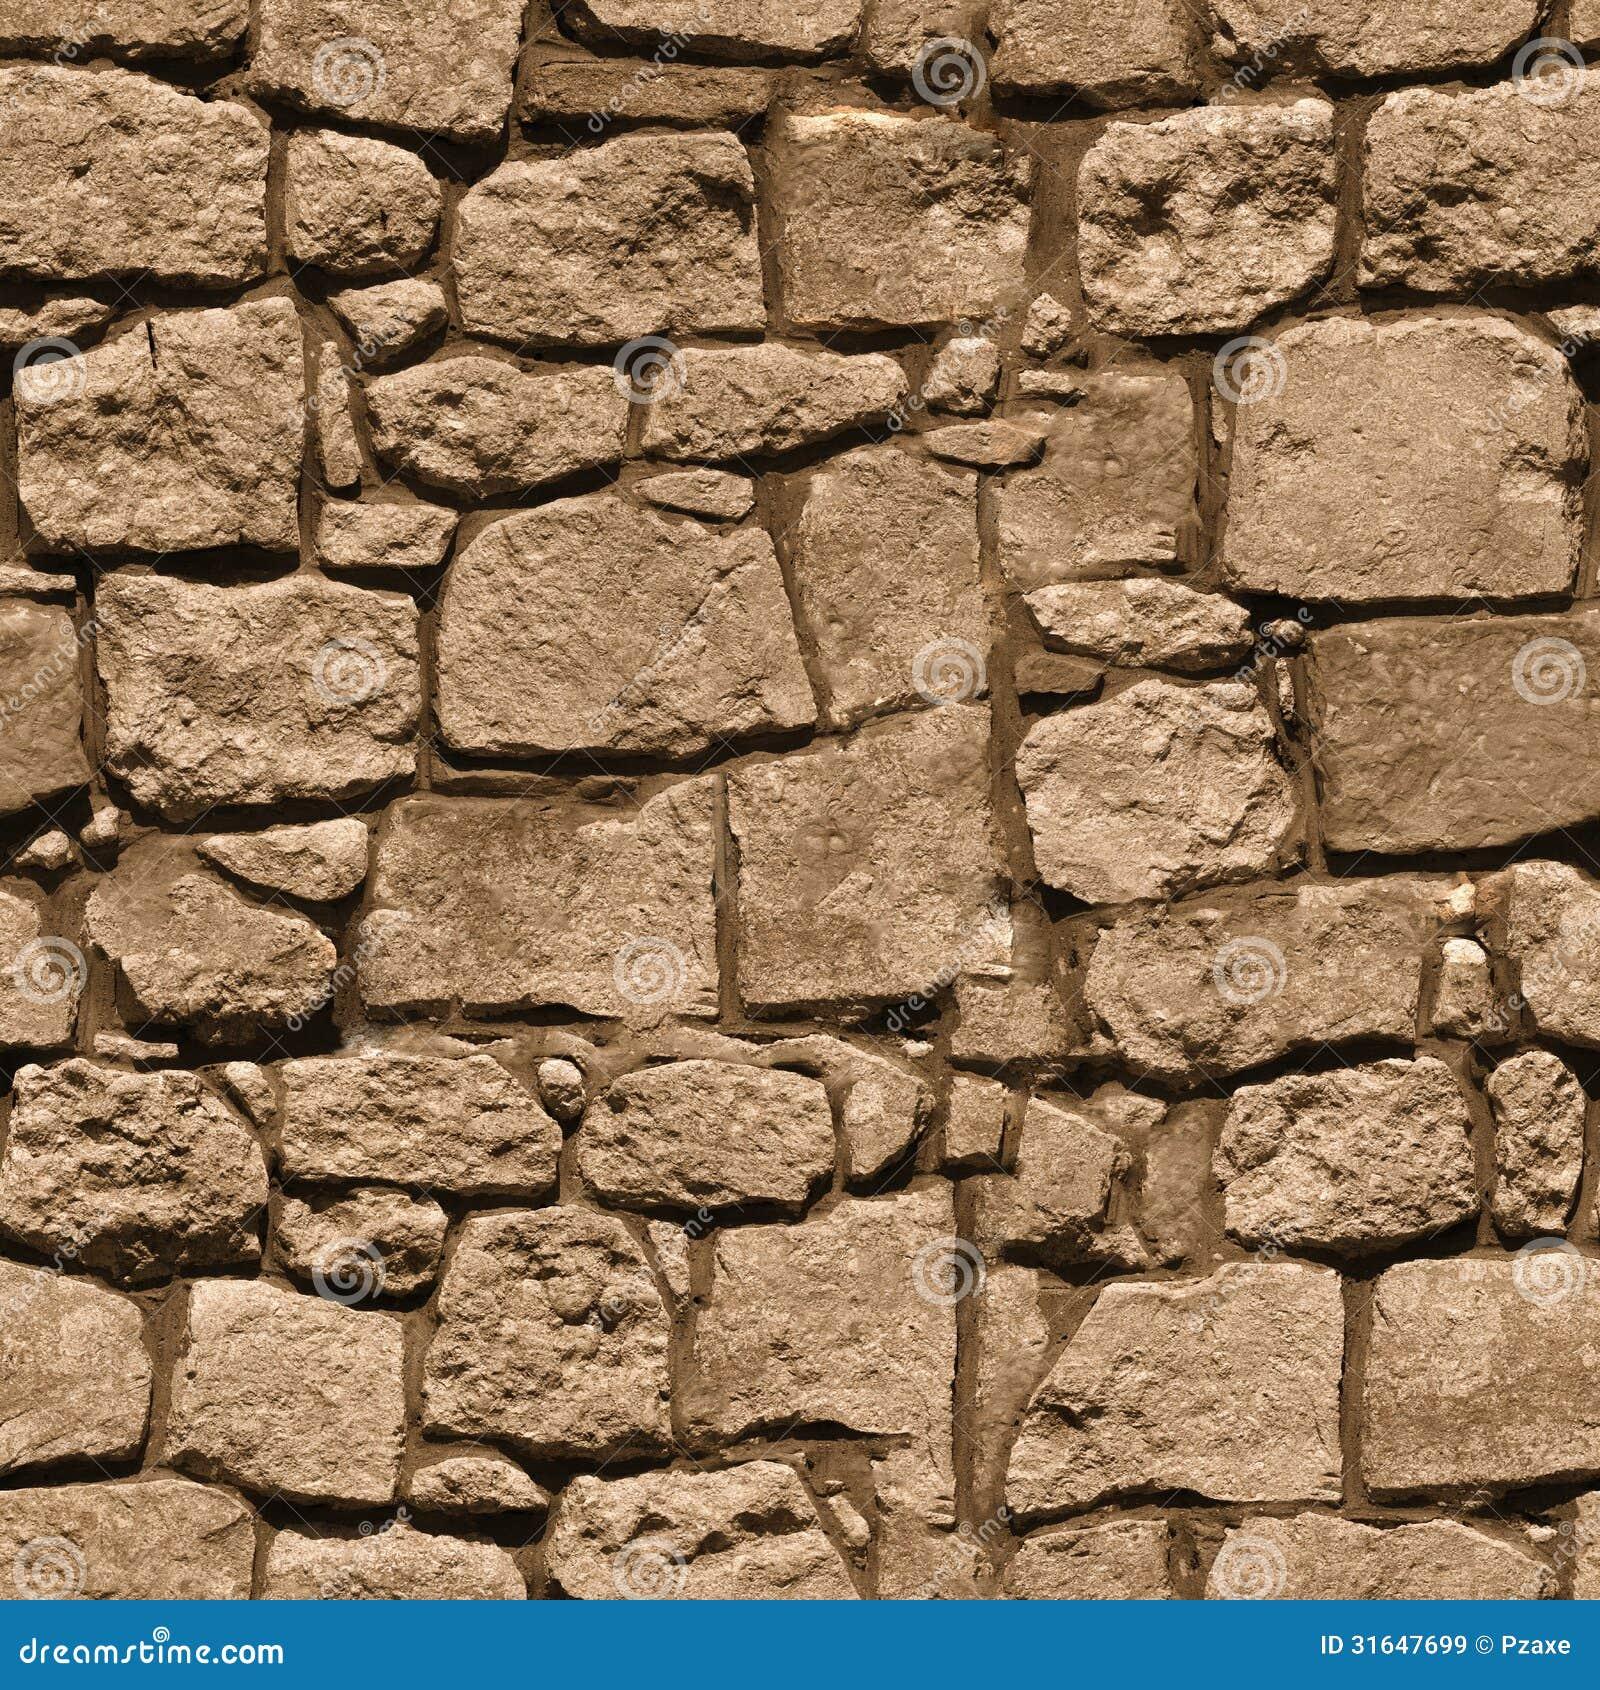 Pared de piedra natural spera grande textura incons til para el dise o imagen de archivo - Pared de piedra natural ...